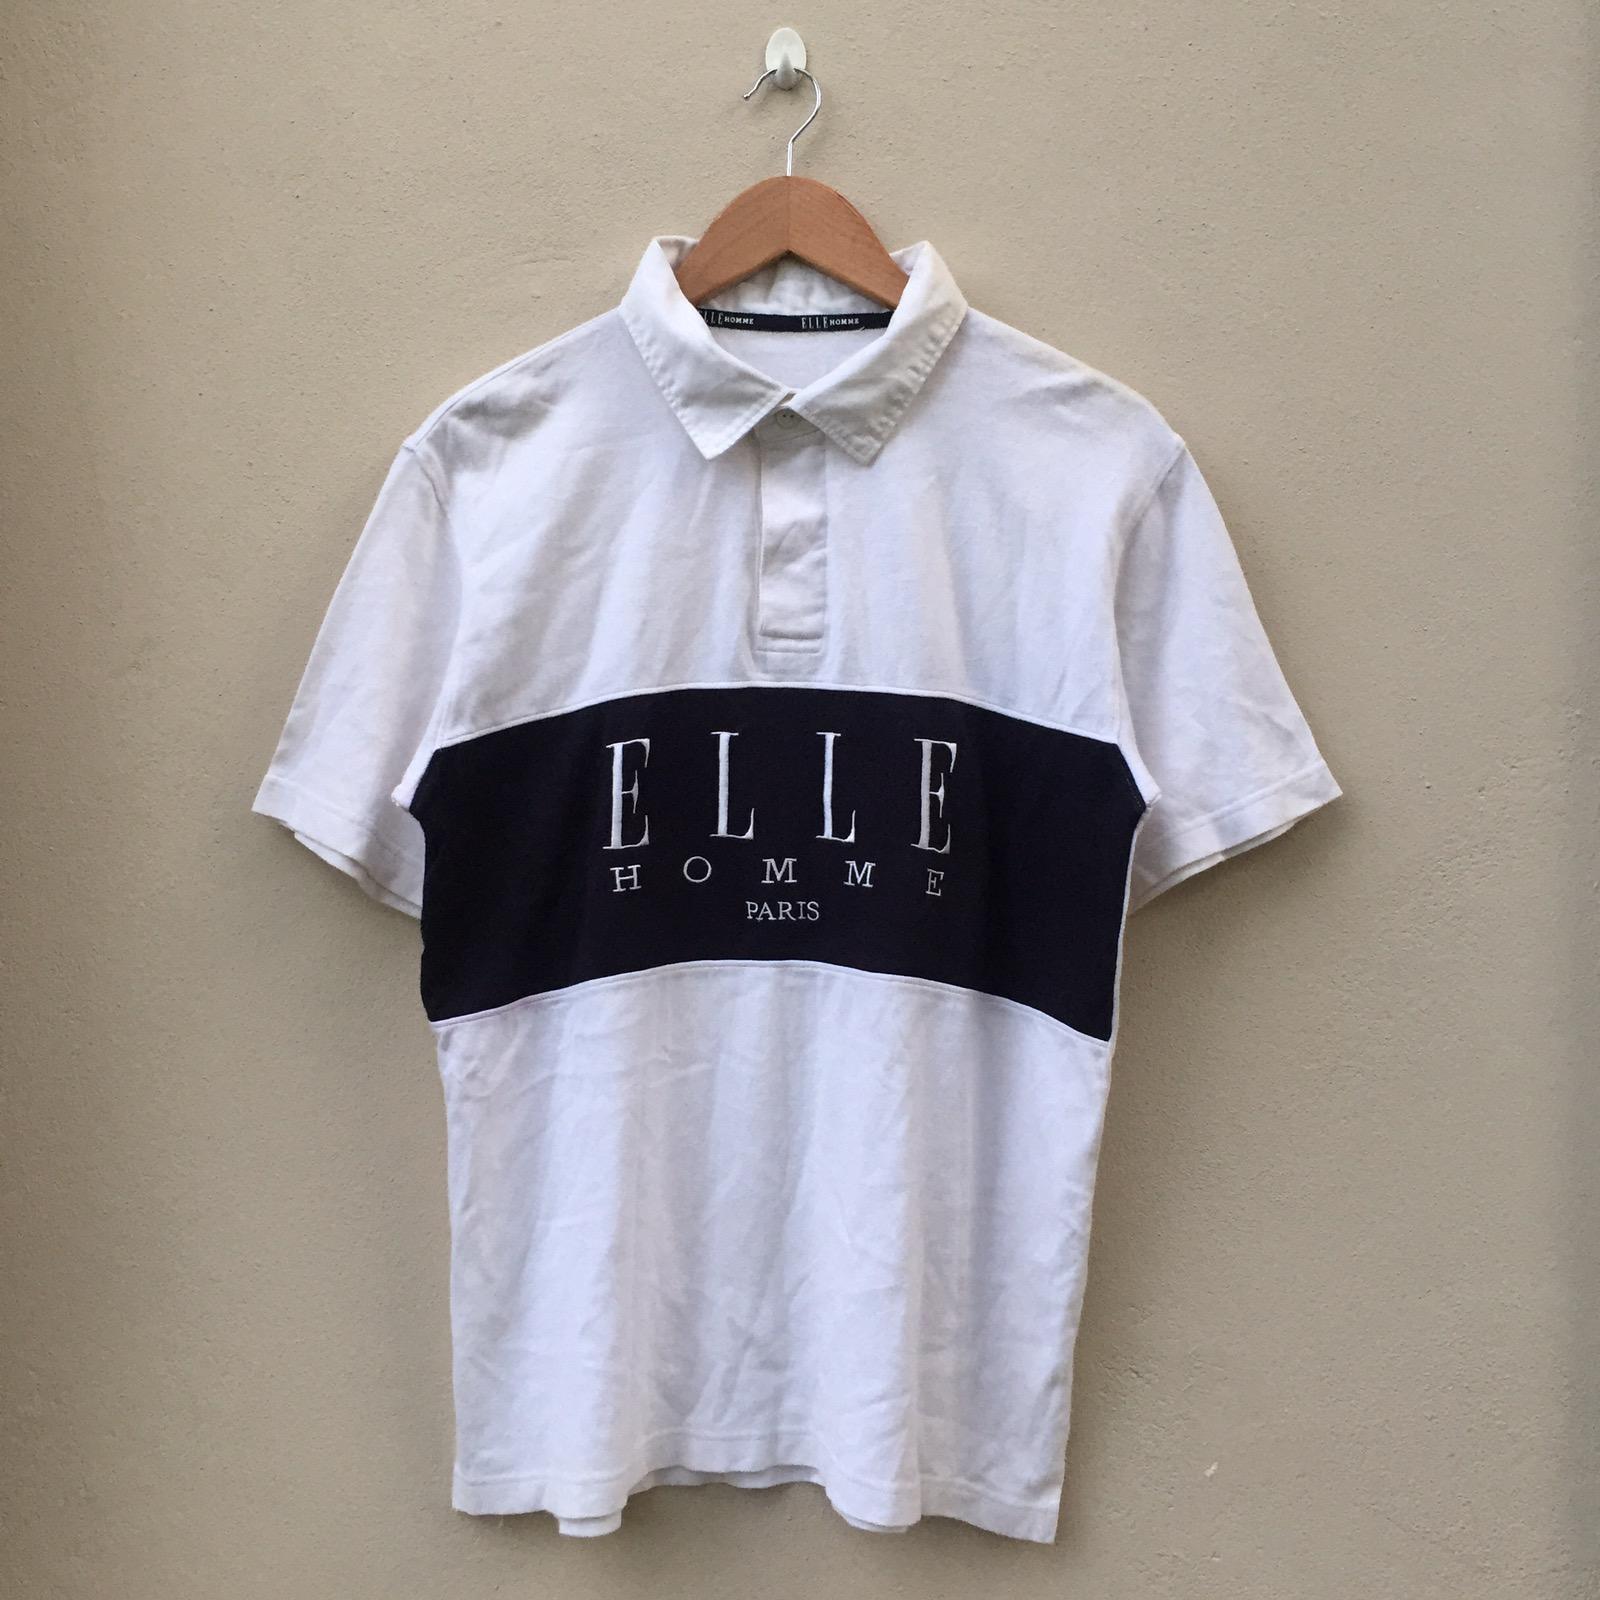 On Sale 32/% Vintage ELLE HOMME PARIS Rugby 80s 90s Short Sleeve Rare Shirt